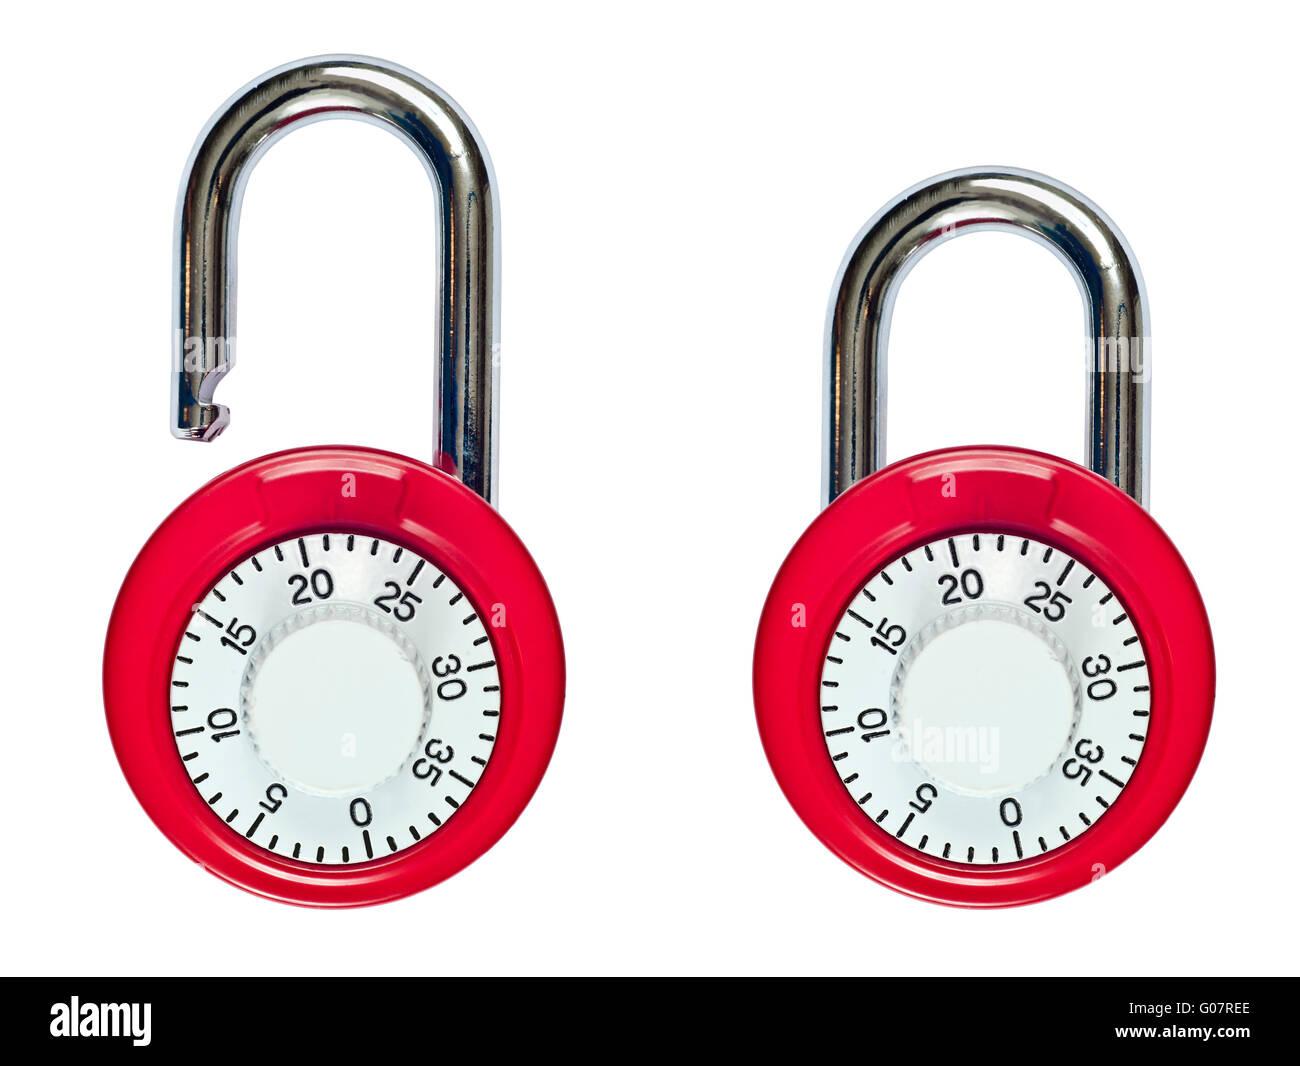 Combination Lock Stock Photos & Combination Lock Stock